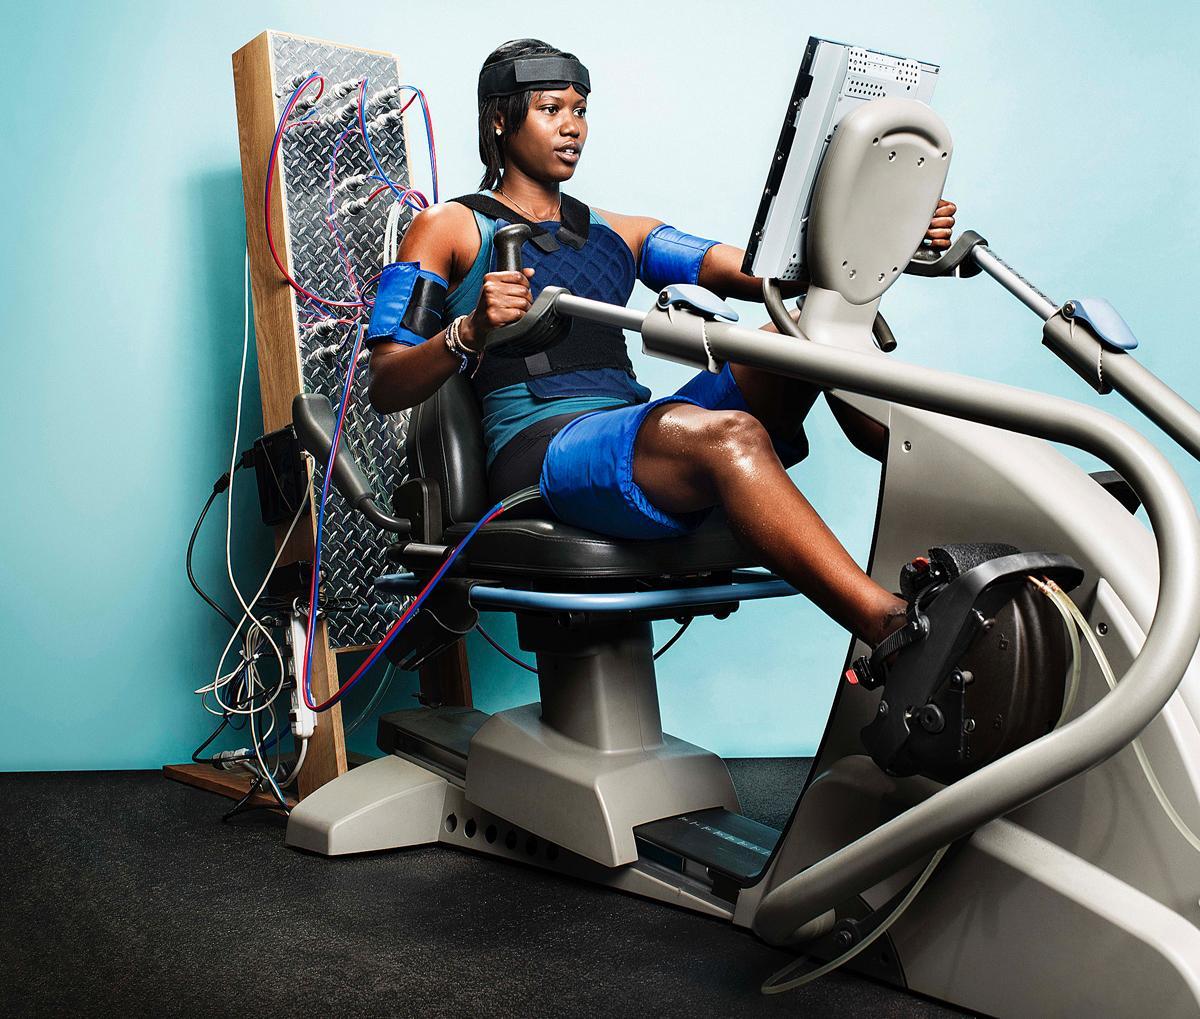 Is Vasper the future of spa fitness offerings